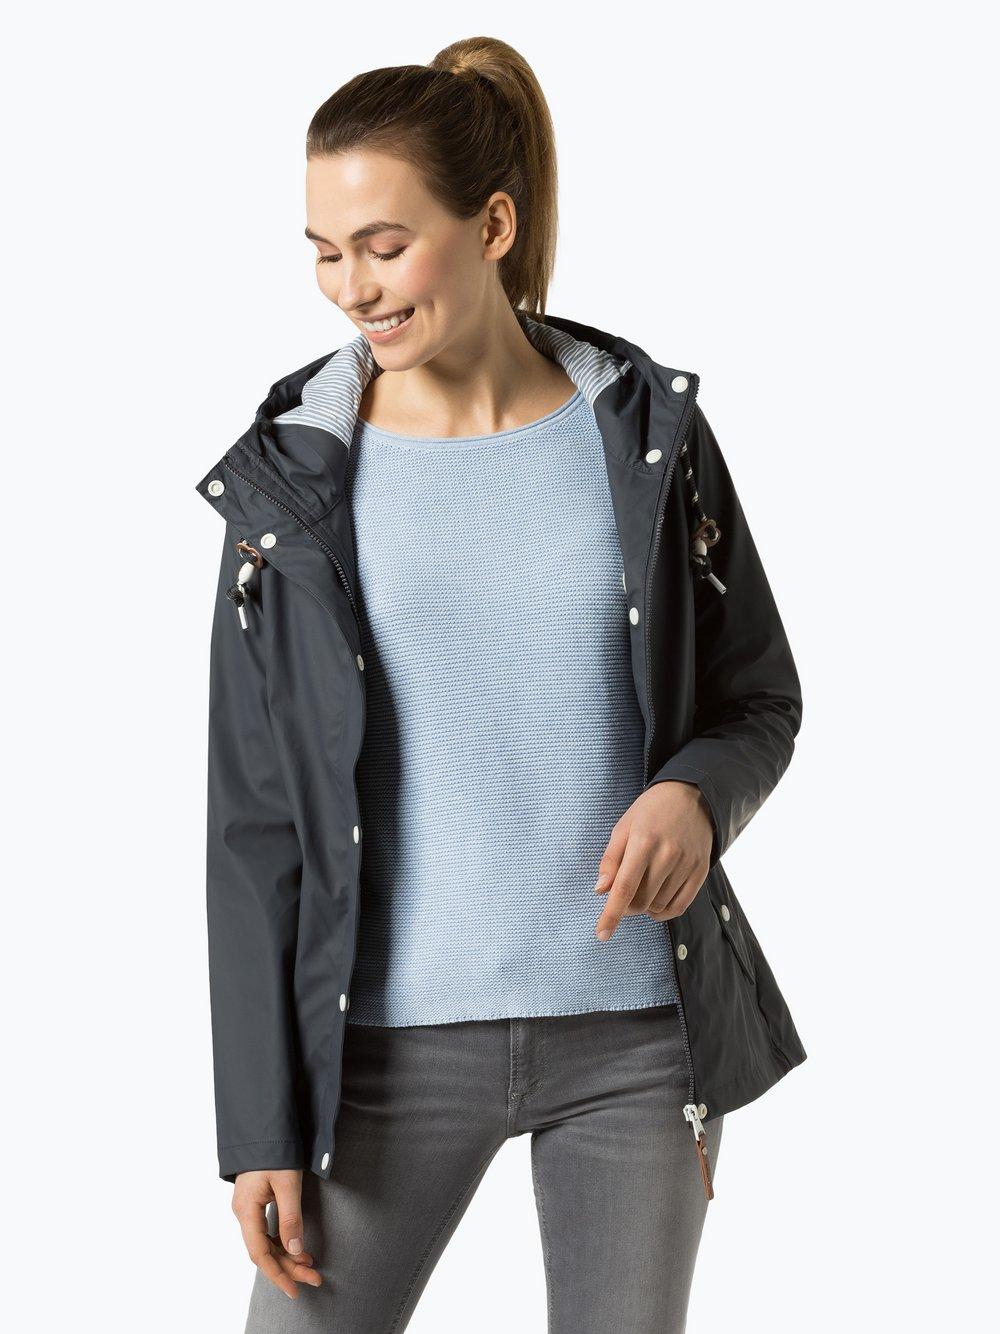 866e7583e69b28 Ragwear Damen Jacke - Marge online kaufen   VANGRAAF.COM